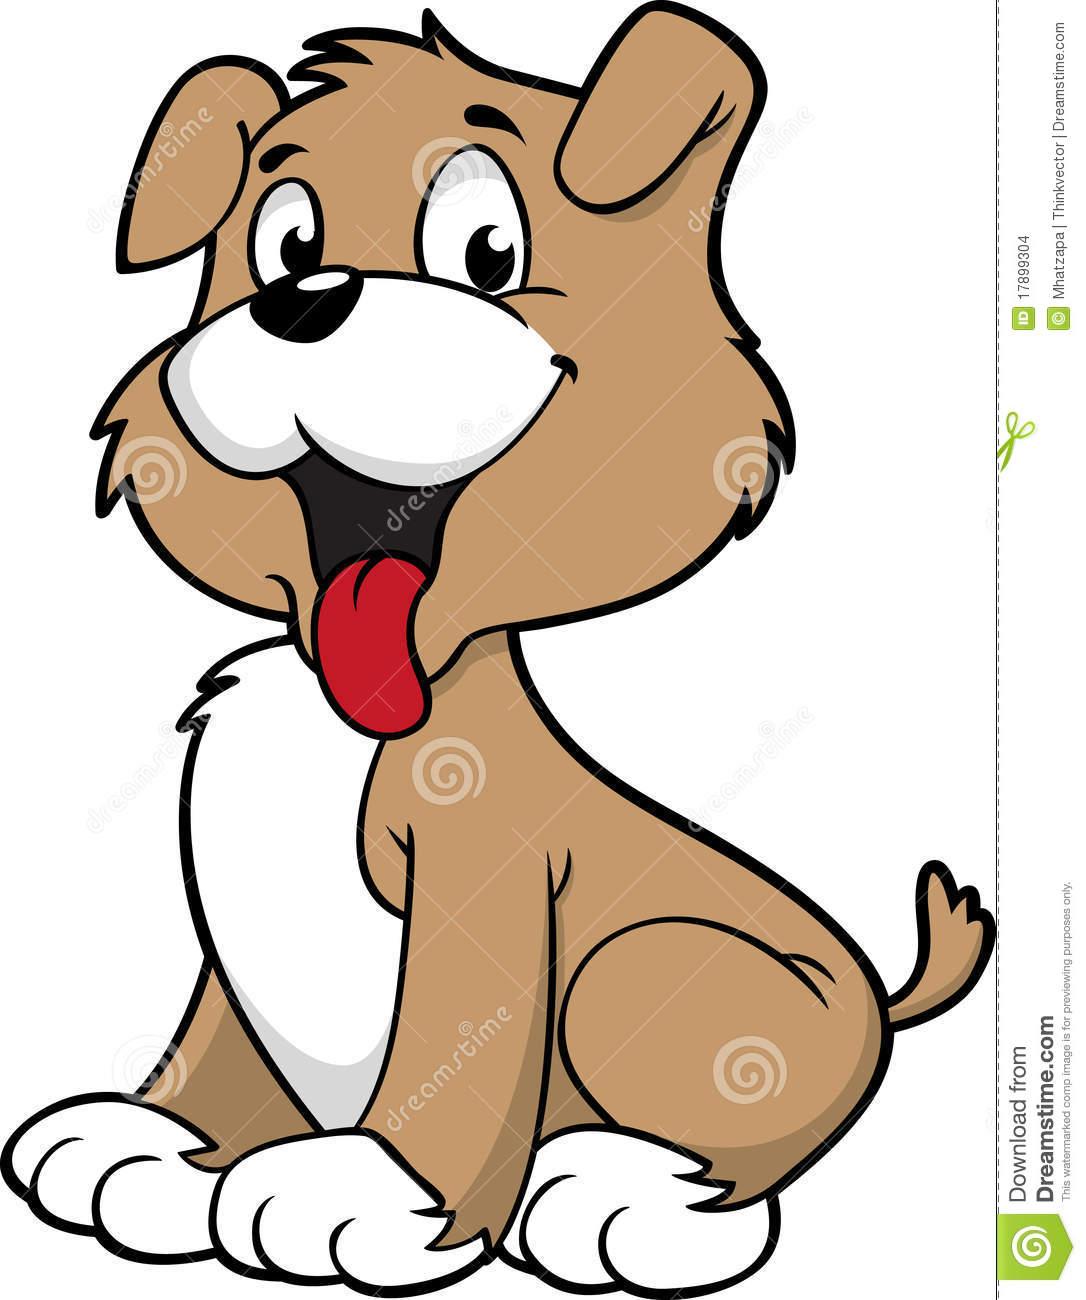 Cute Dog Clipart Clipart Panda Free Clip-Cute Dog Clipart Clipart Panda Free Clipart Images-9